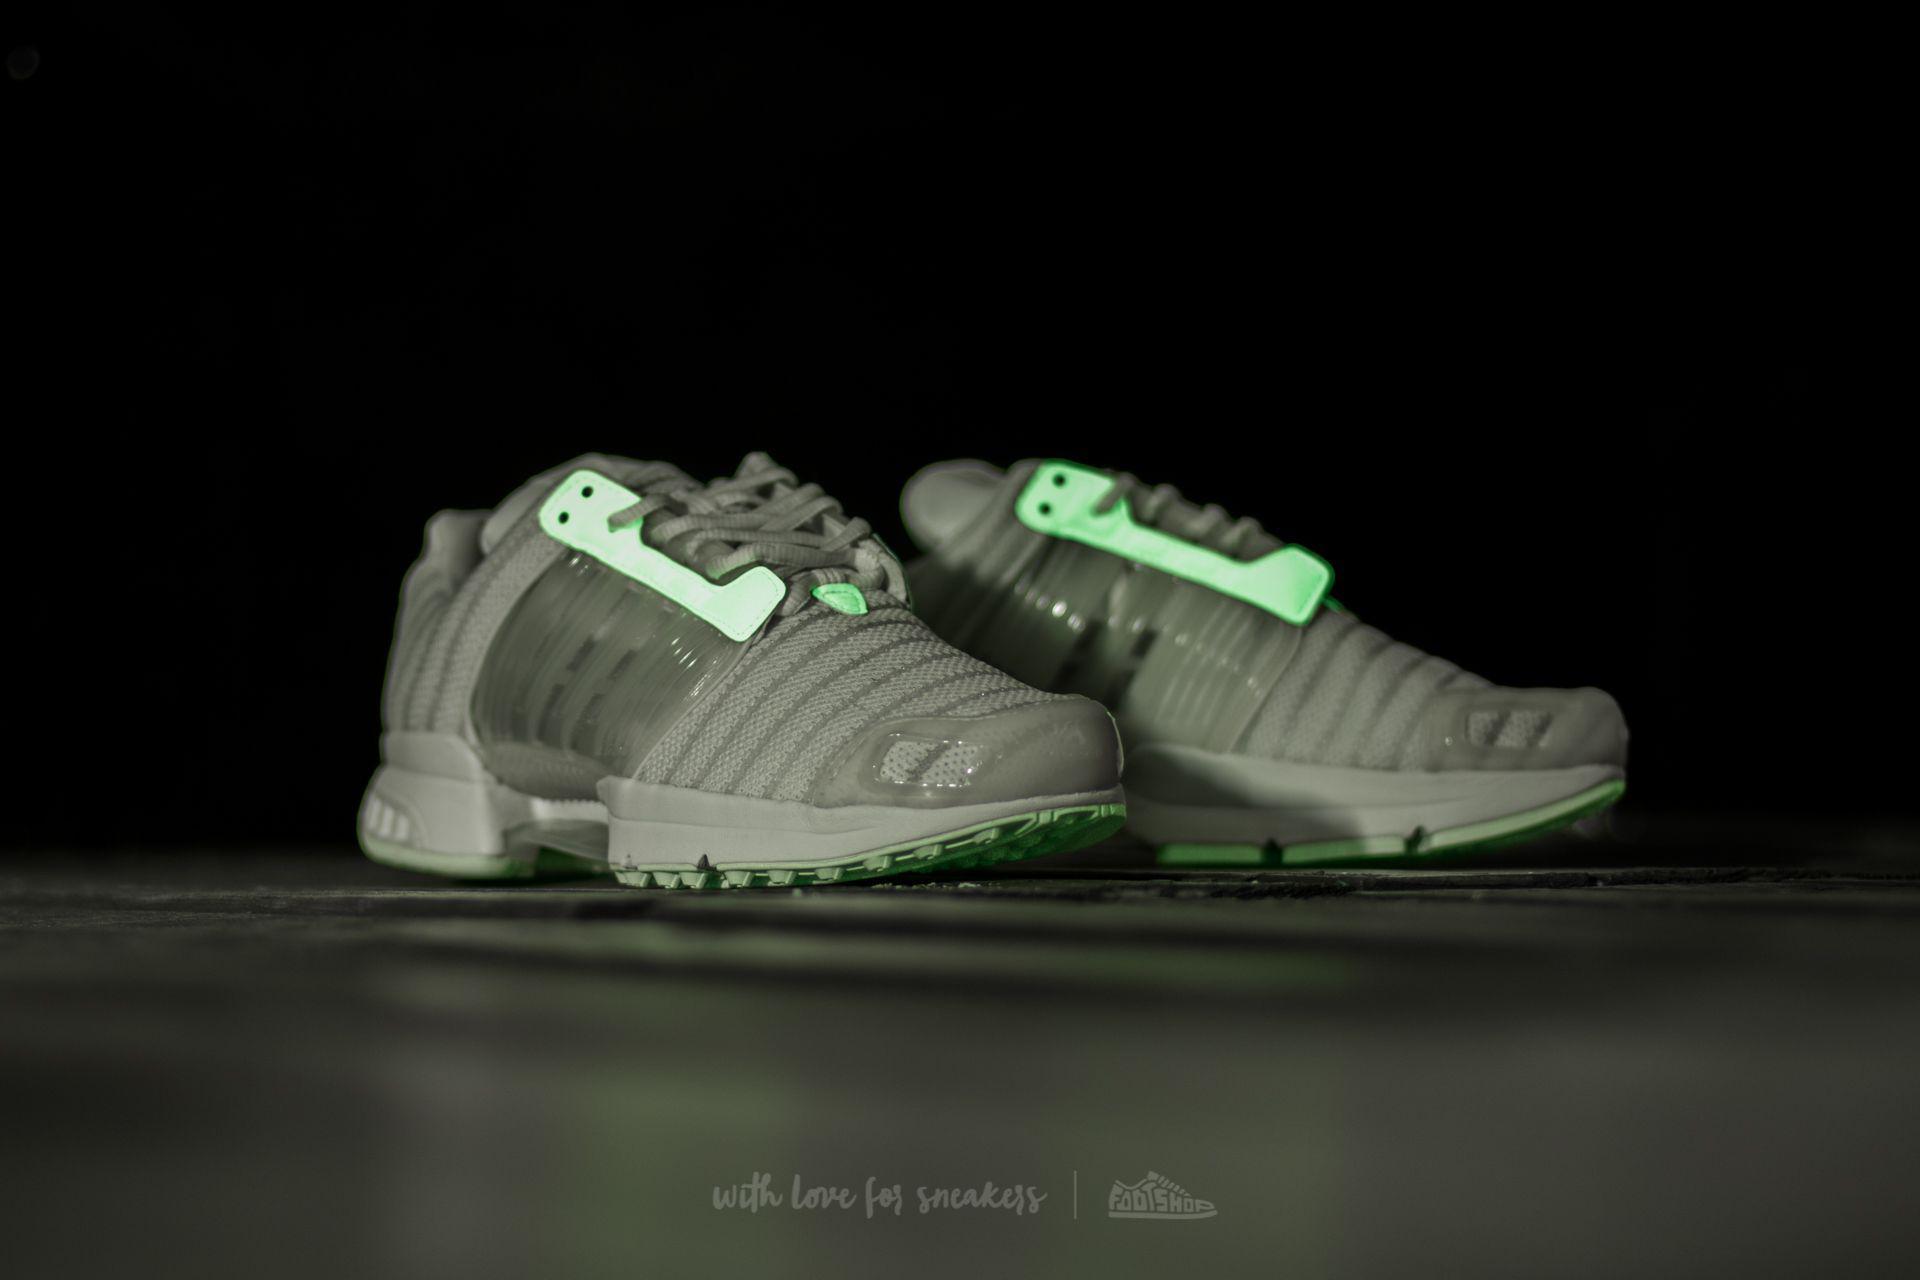 5629e9e4eb29 Lyst - adidas Originals Adidas Consortium X Sneakerboy X Wish ...